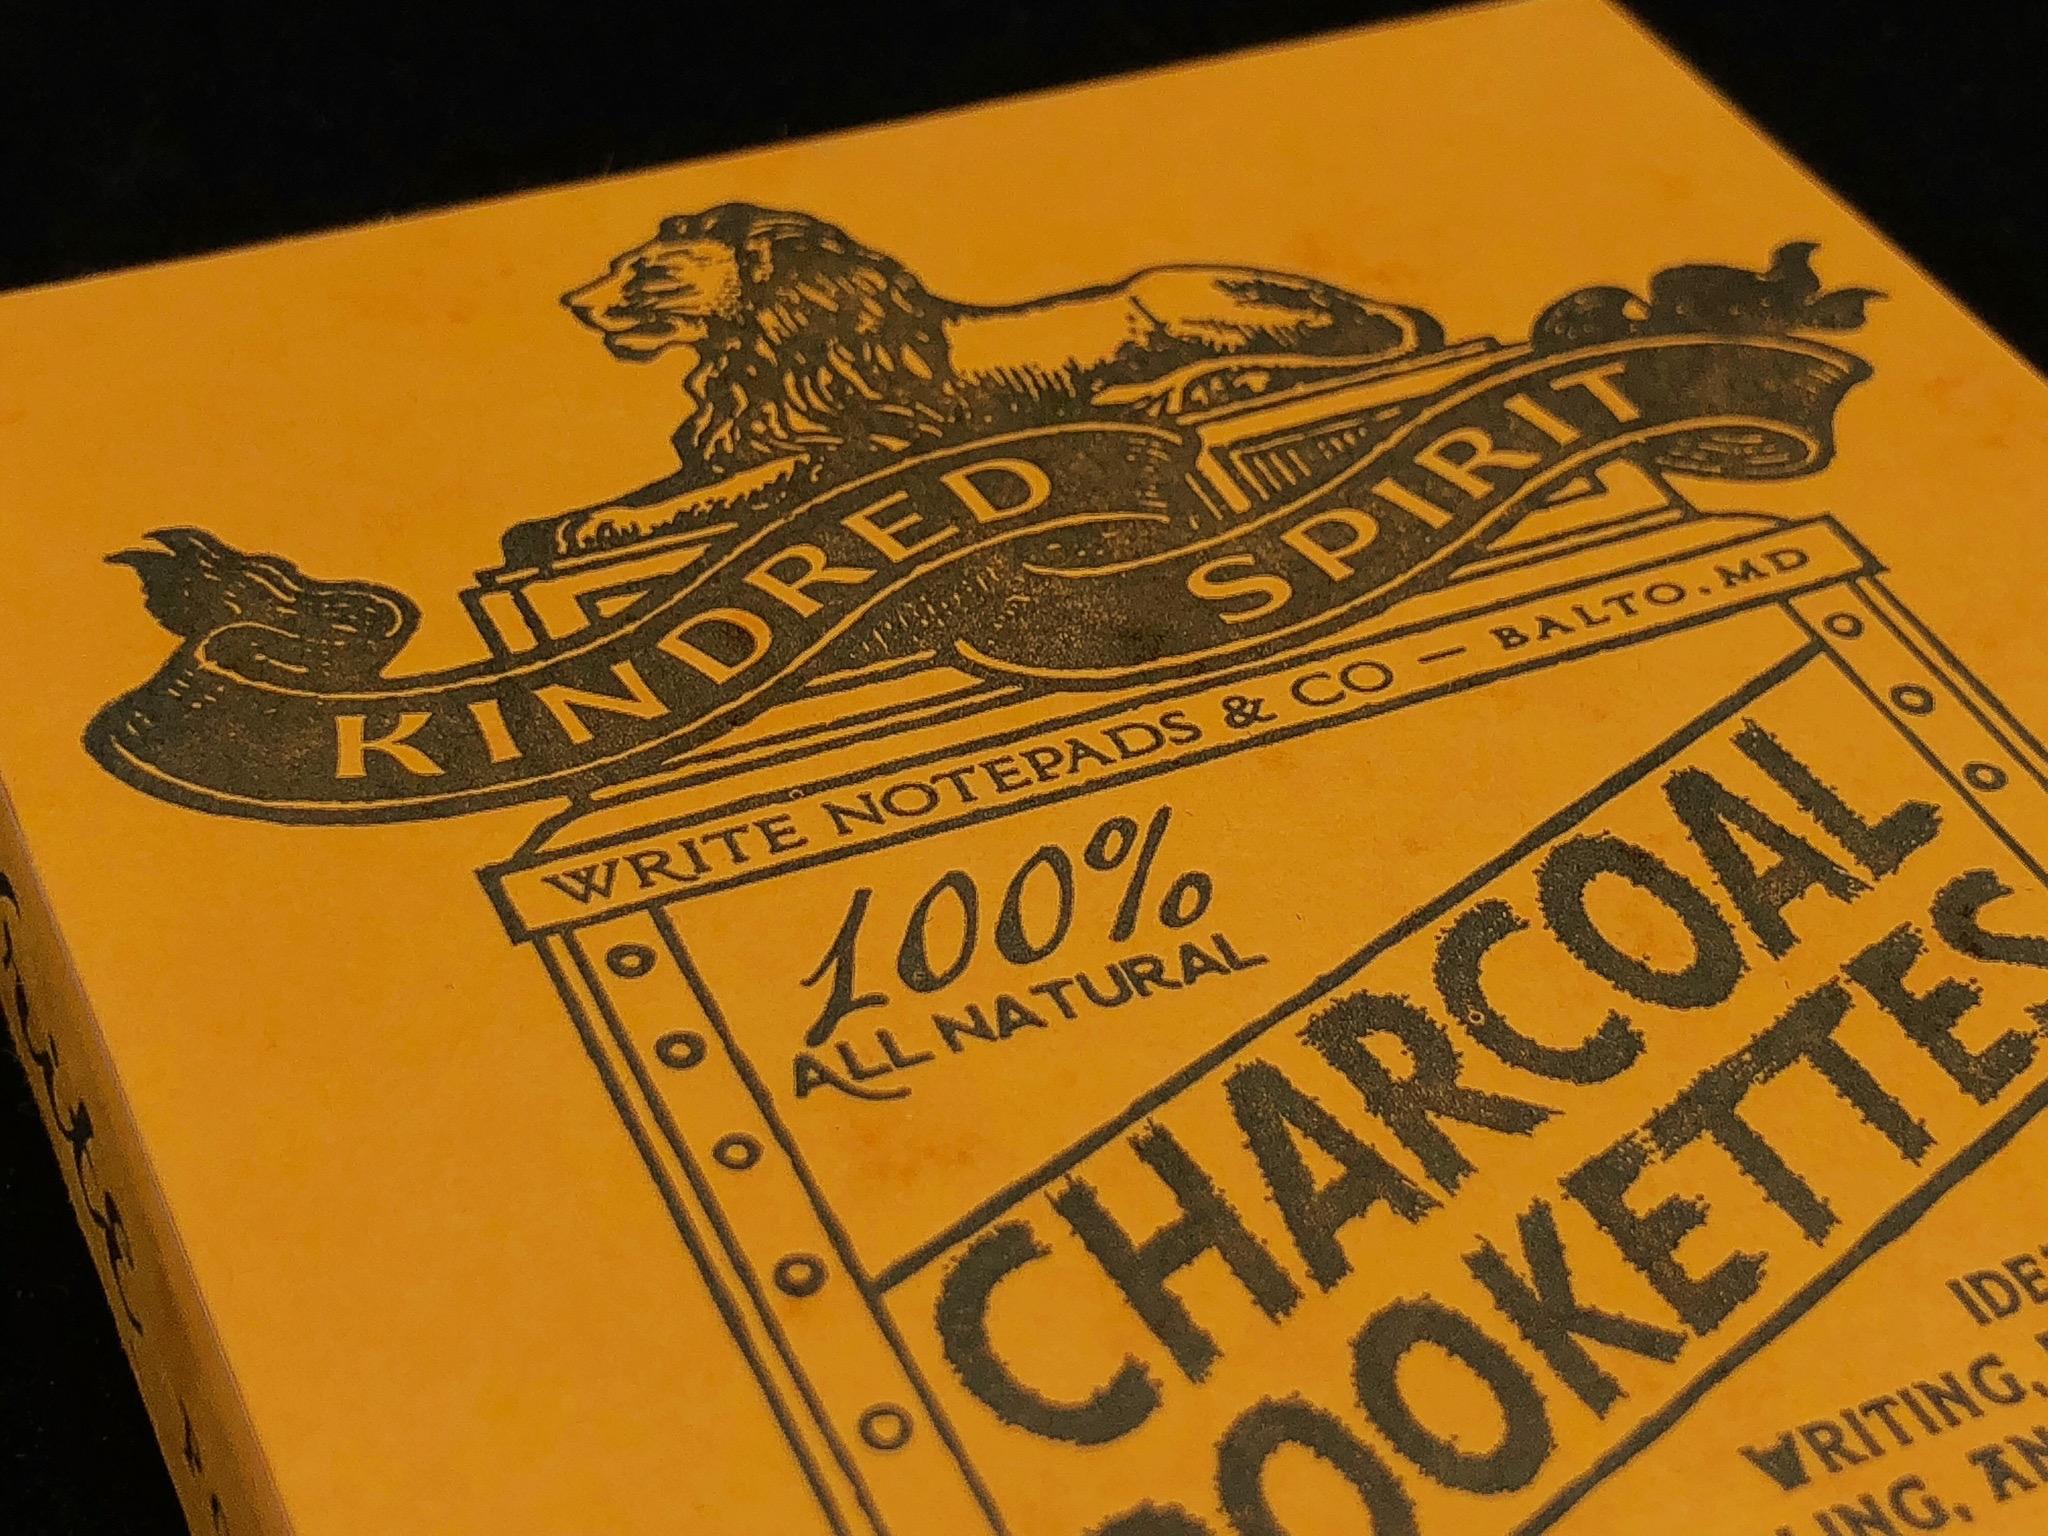 write-notepads-kindred-spirit-notebook-4.jpg